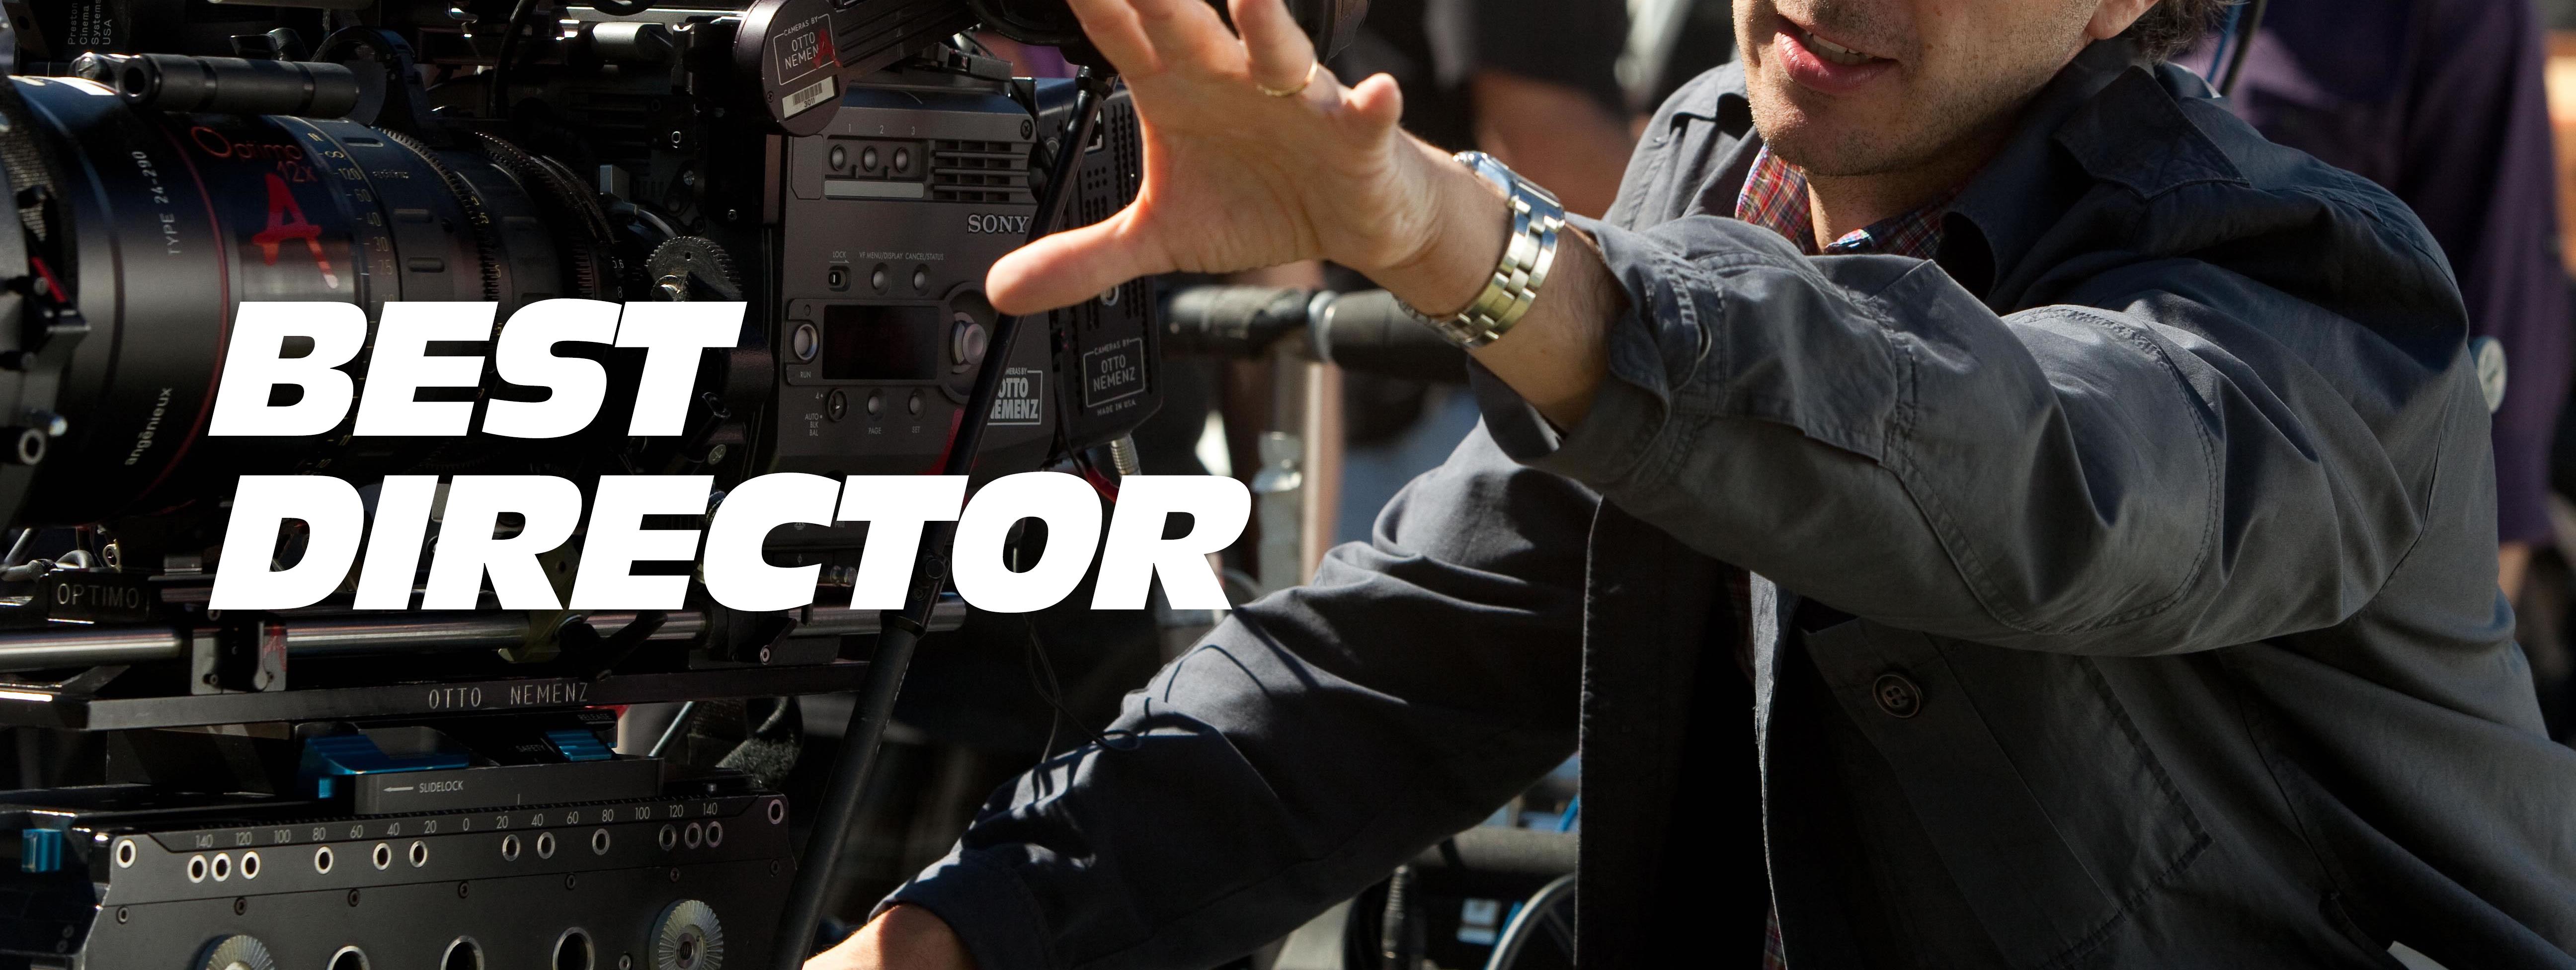 Best Director Slide